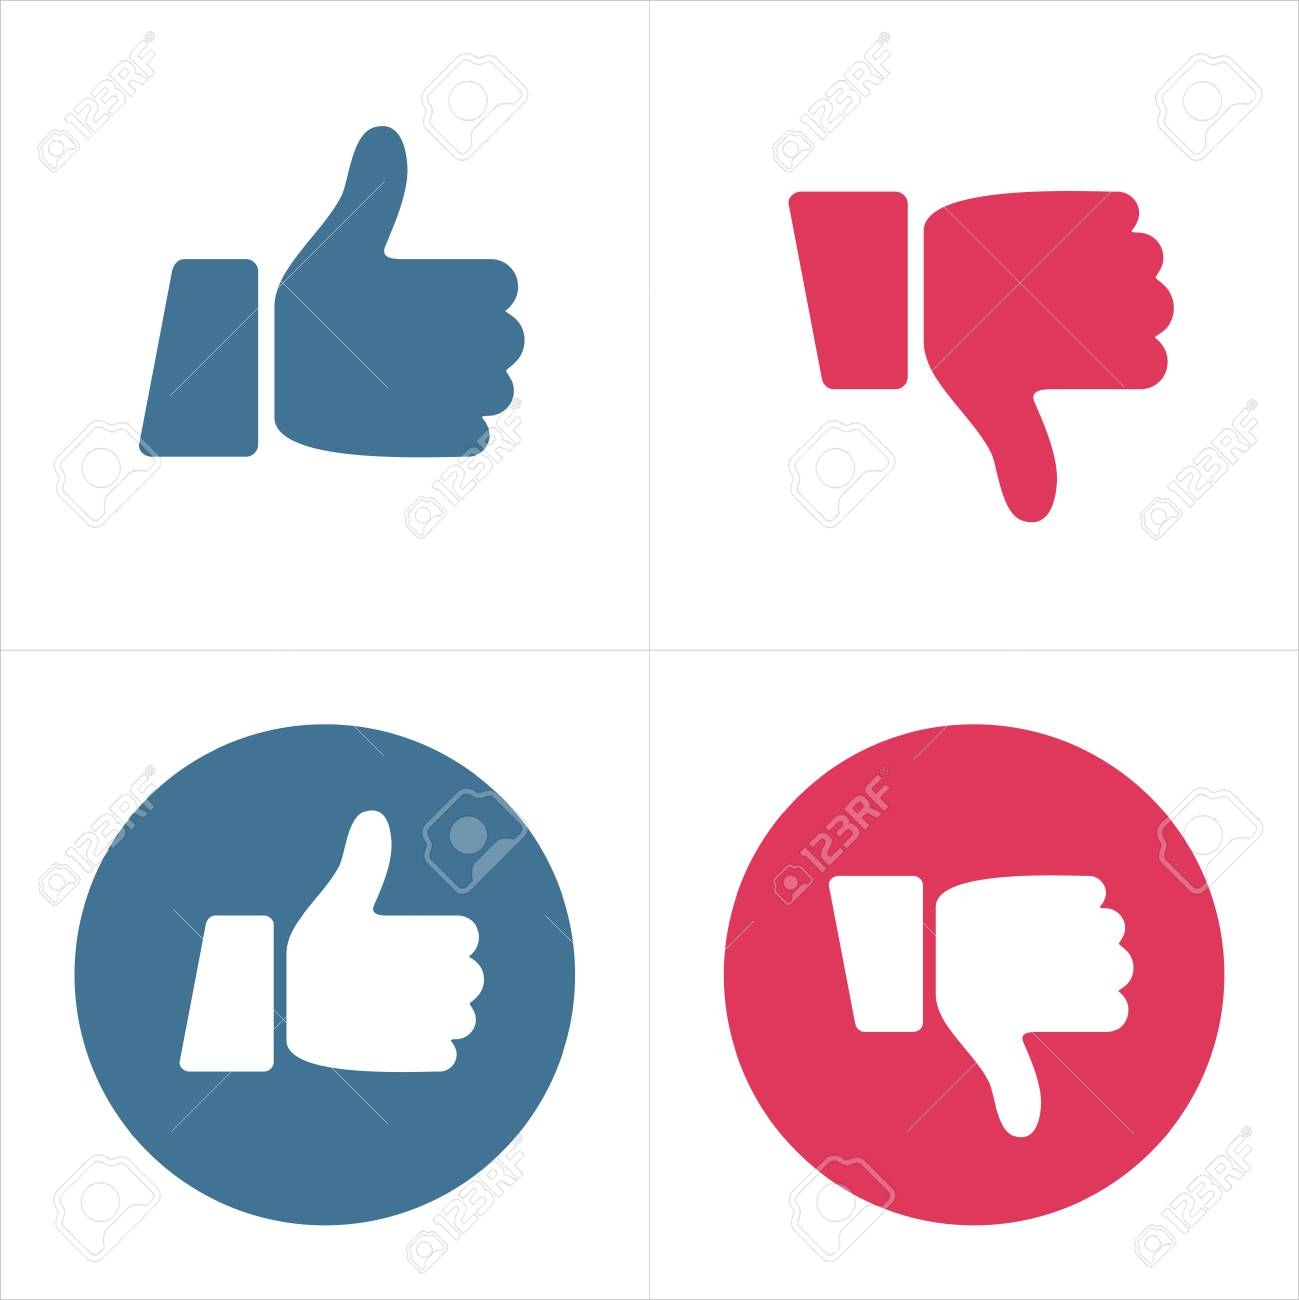 Like and Dislike Icons -Thumb Up and Thumb Down - illustration vector - 128499748